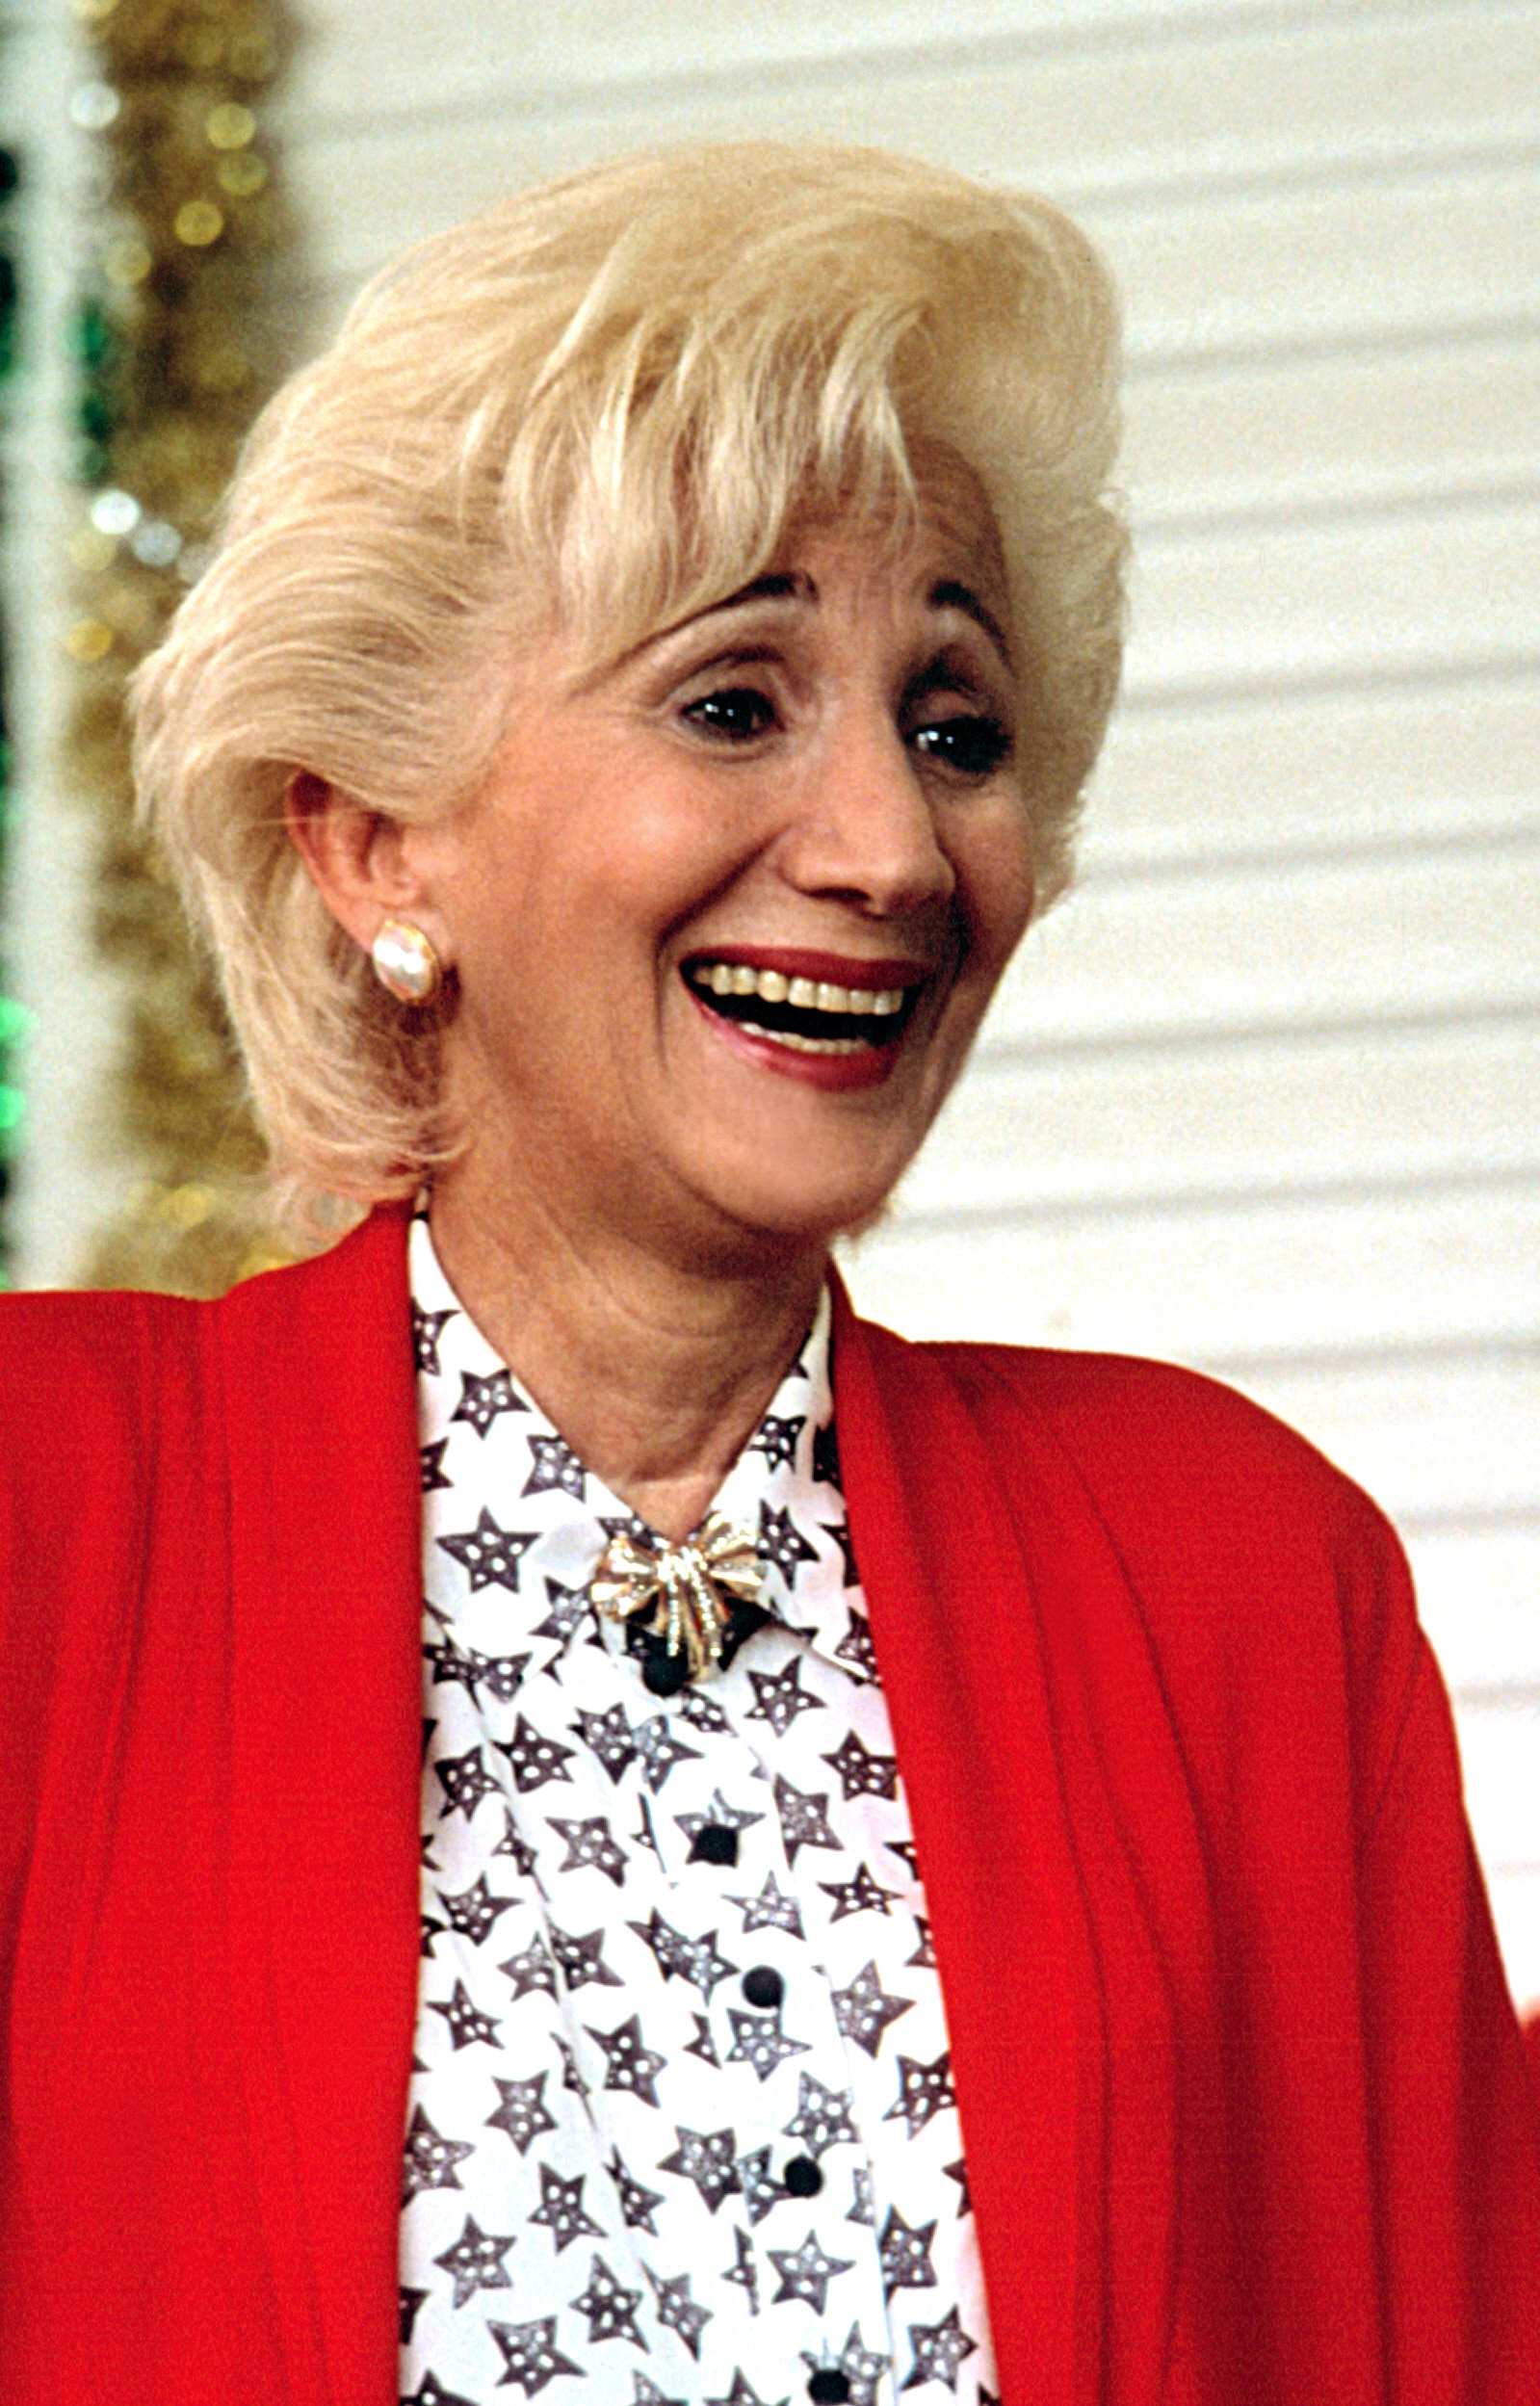 STEEL MAGNOLIAS, Olympia Dukakis, 1989